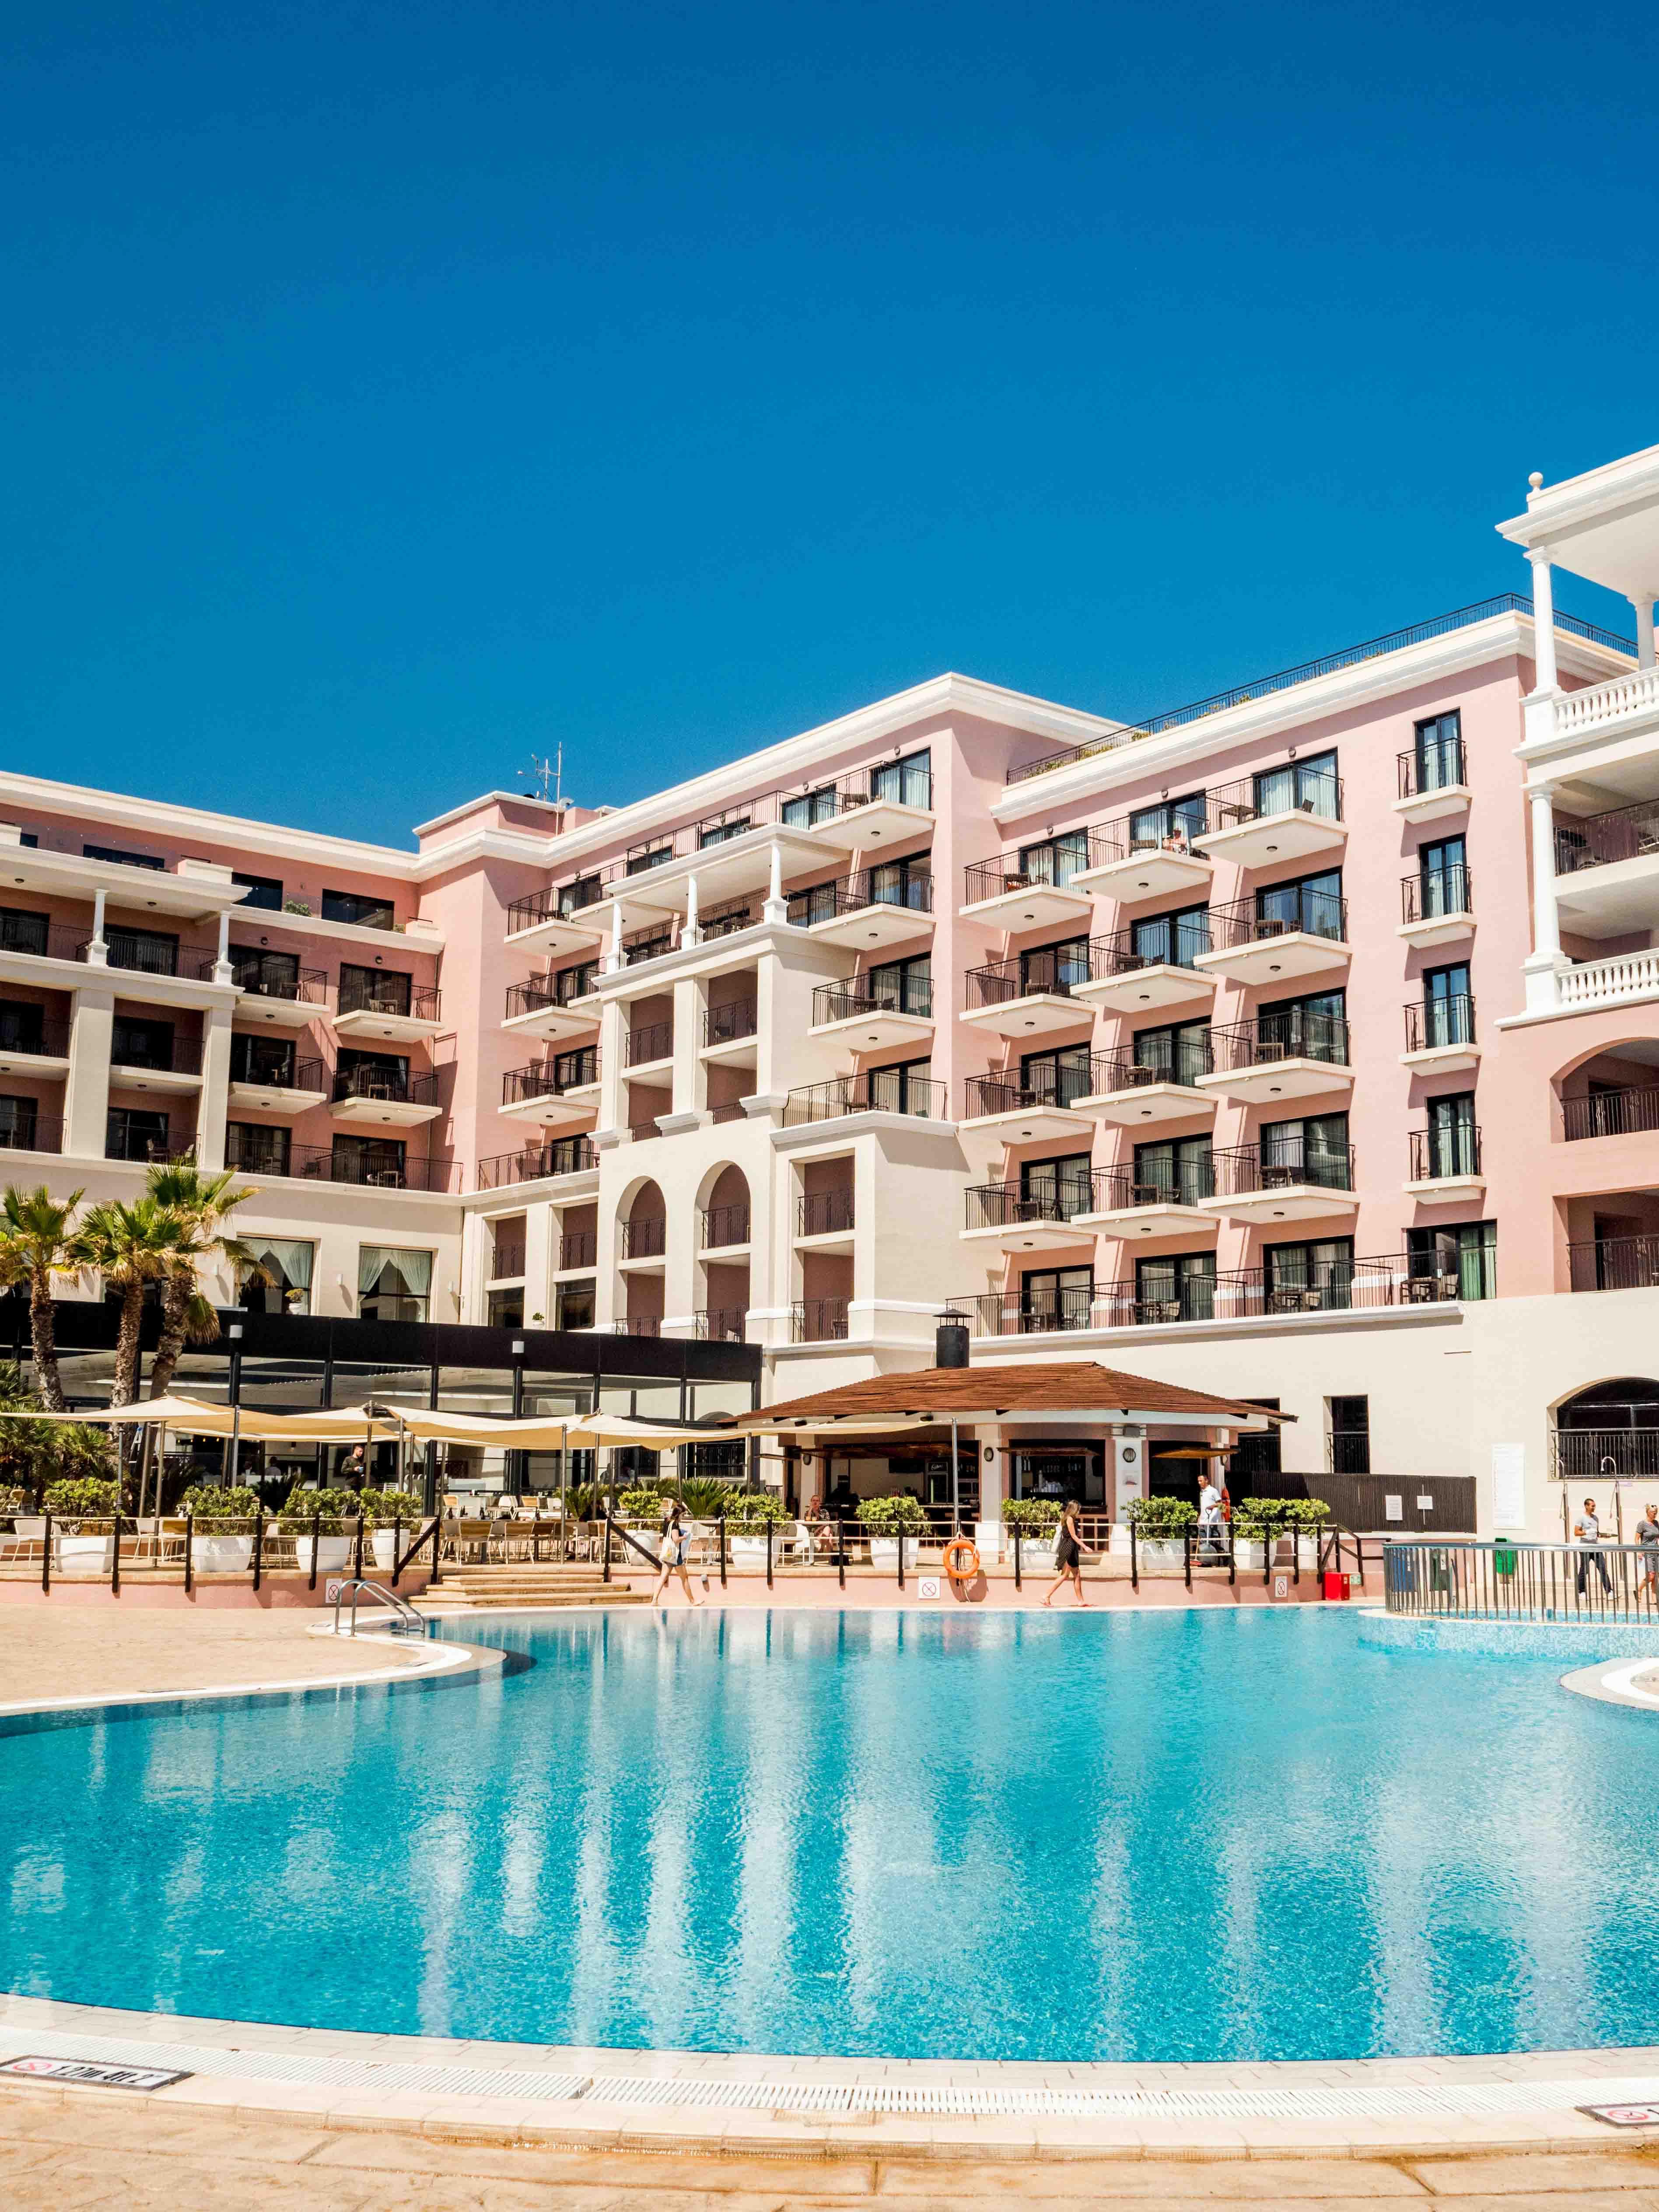 Westin hotel, Malta